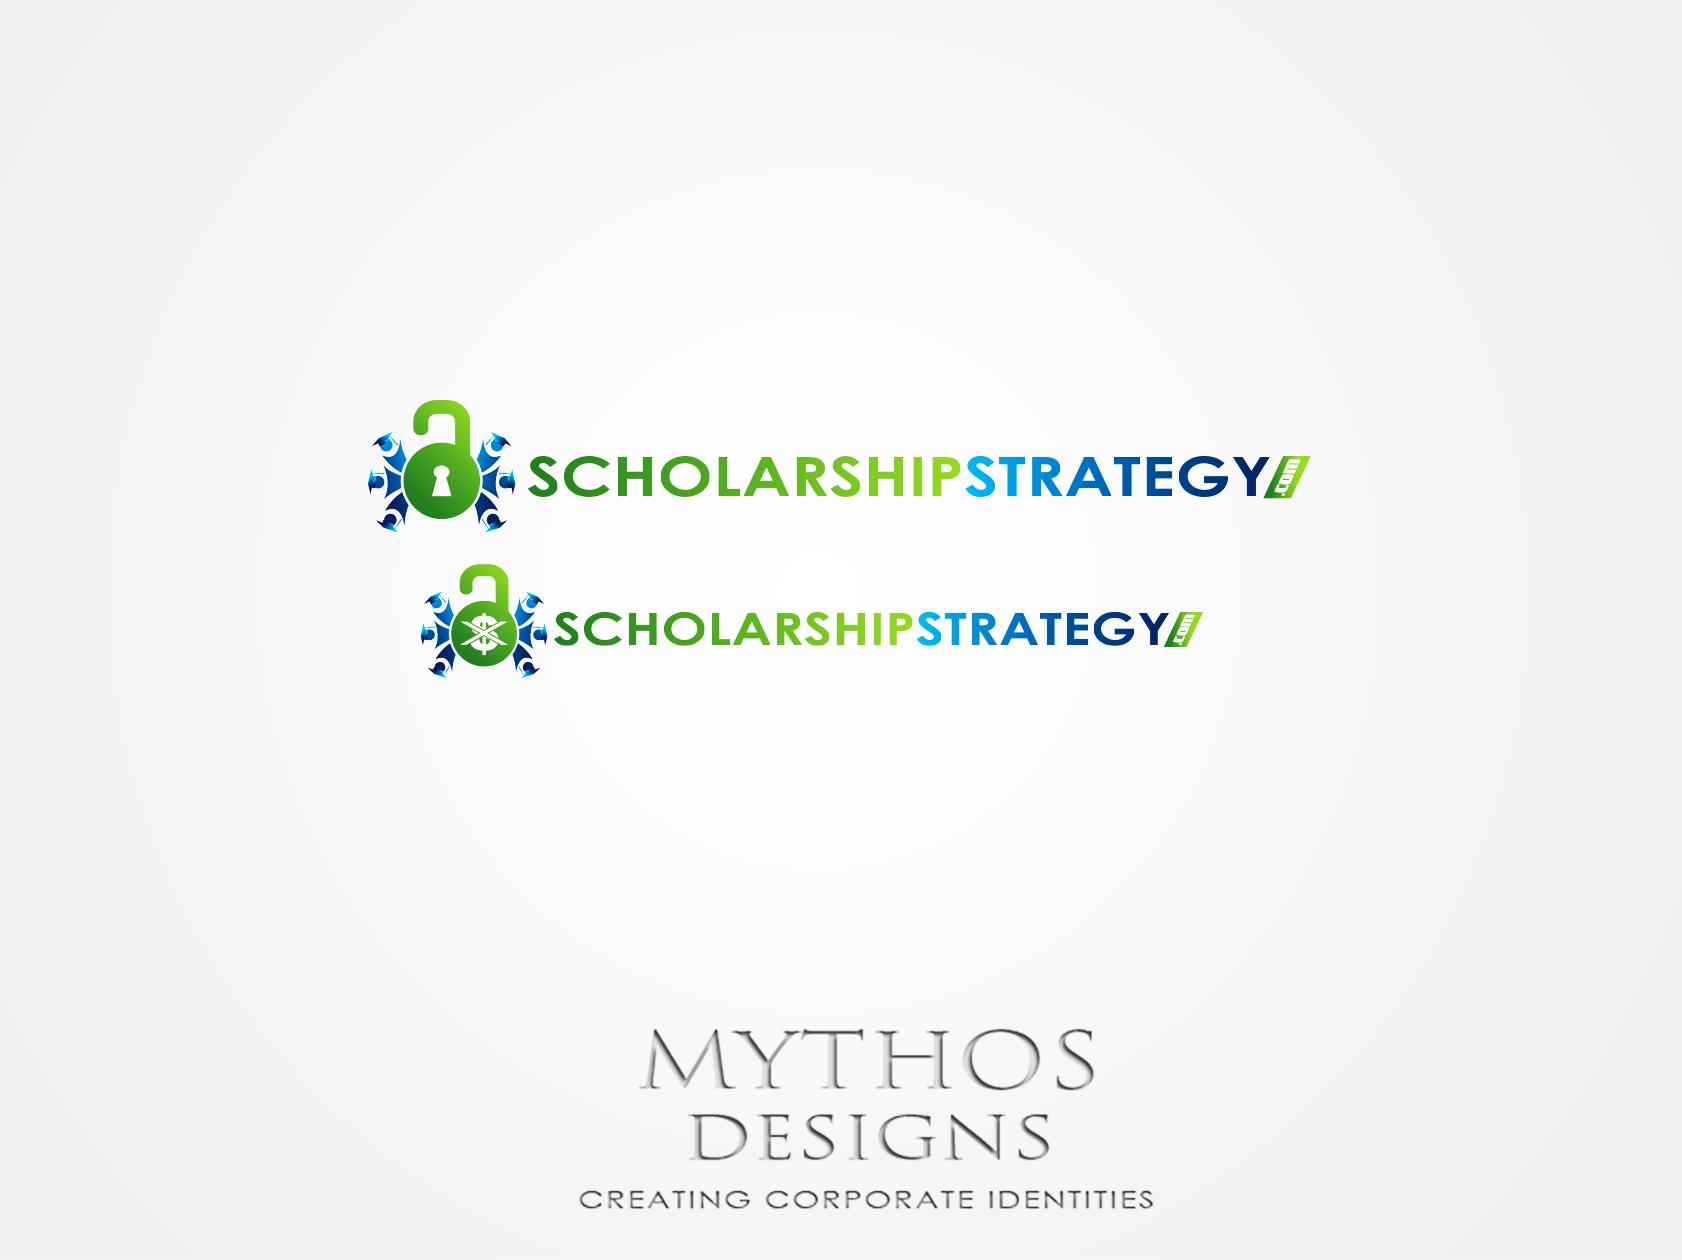 Logo Design by Mythos Designs - Entry No. 71 in the Logo Design Contest Captivating Logo Design for Scholarshipstrategy.com.